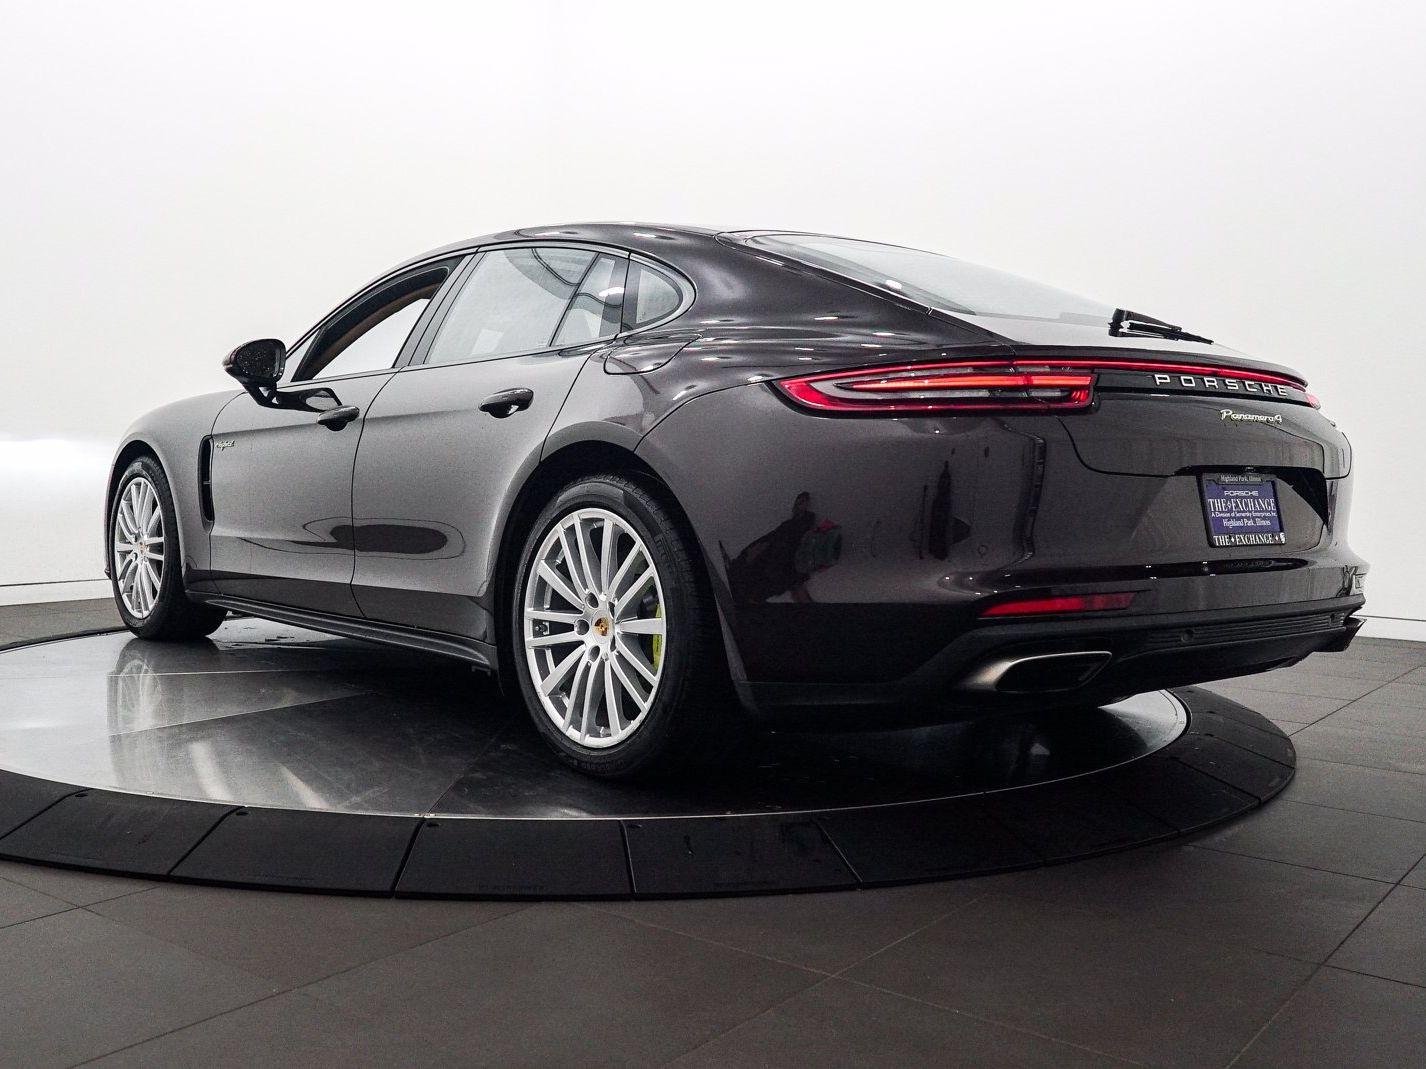 2018 Porsche Panamera 4 E-Hybrid – 5